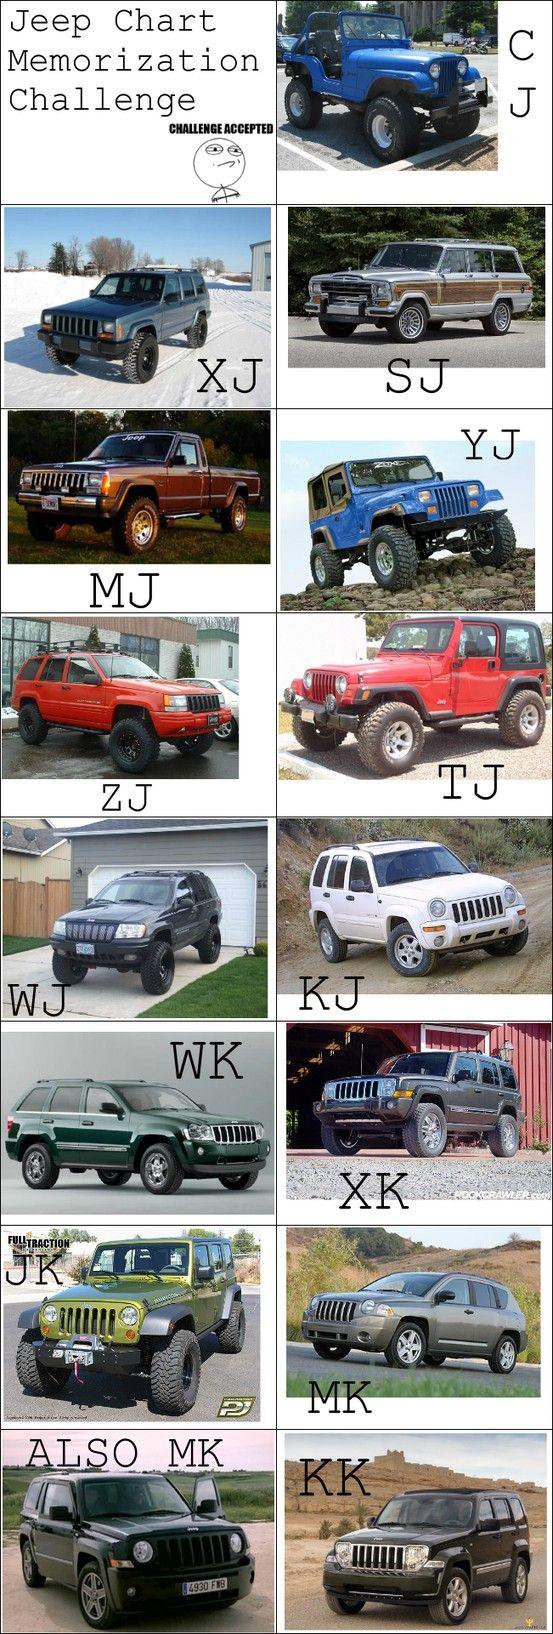 Jeep Body Type Chart - Jeep Memorization Challenge